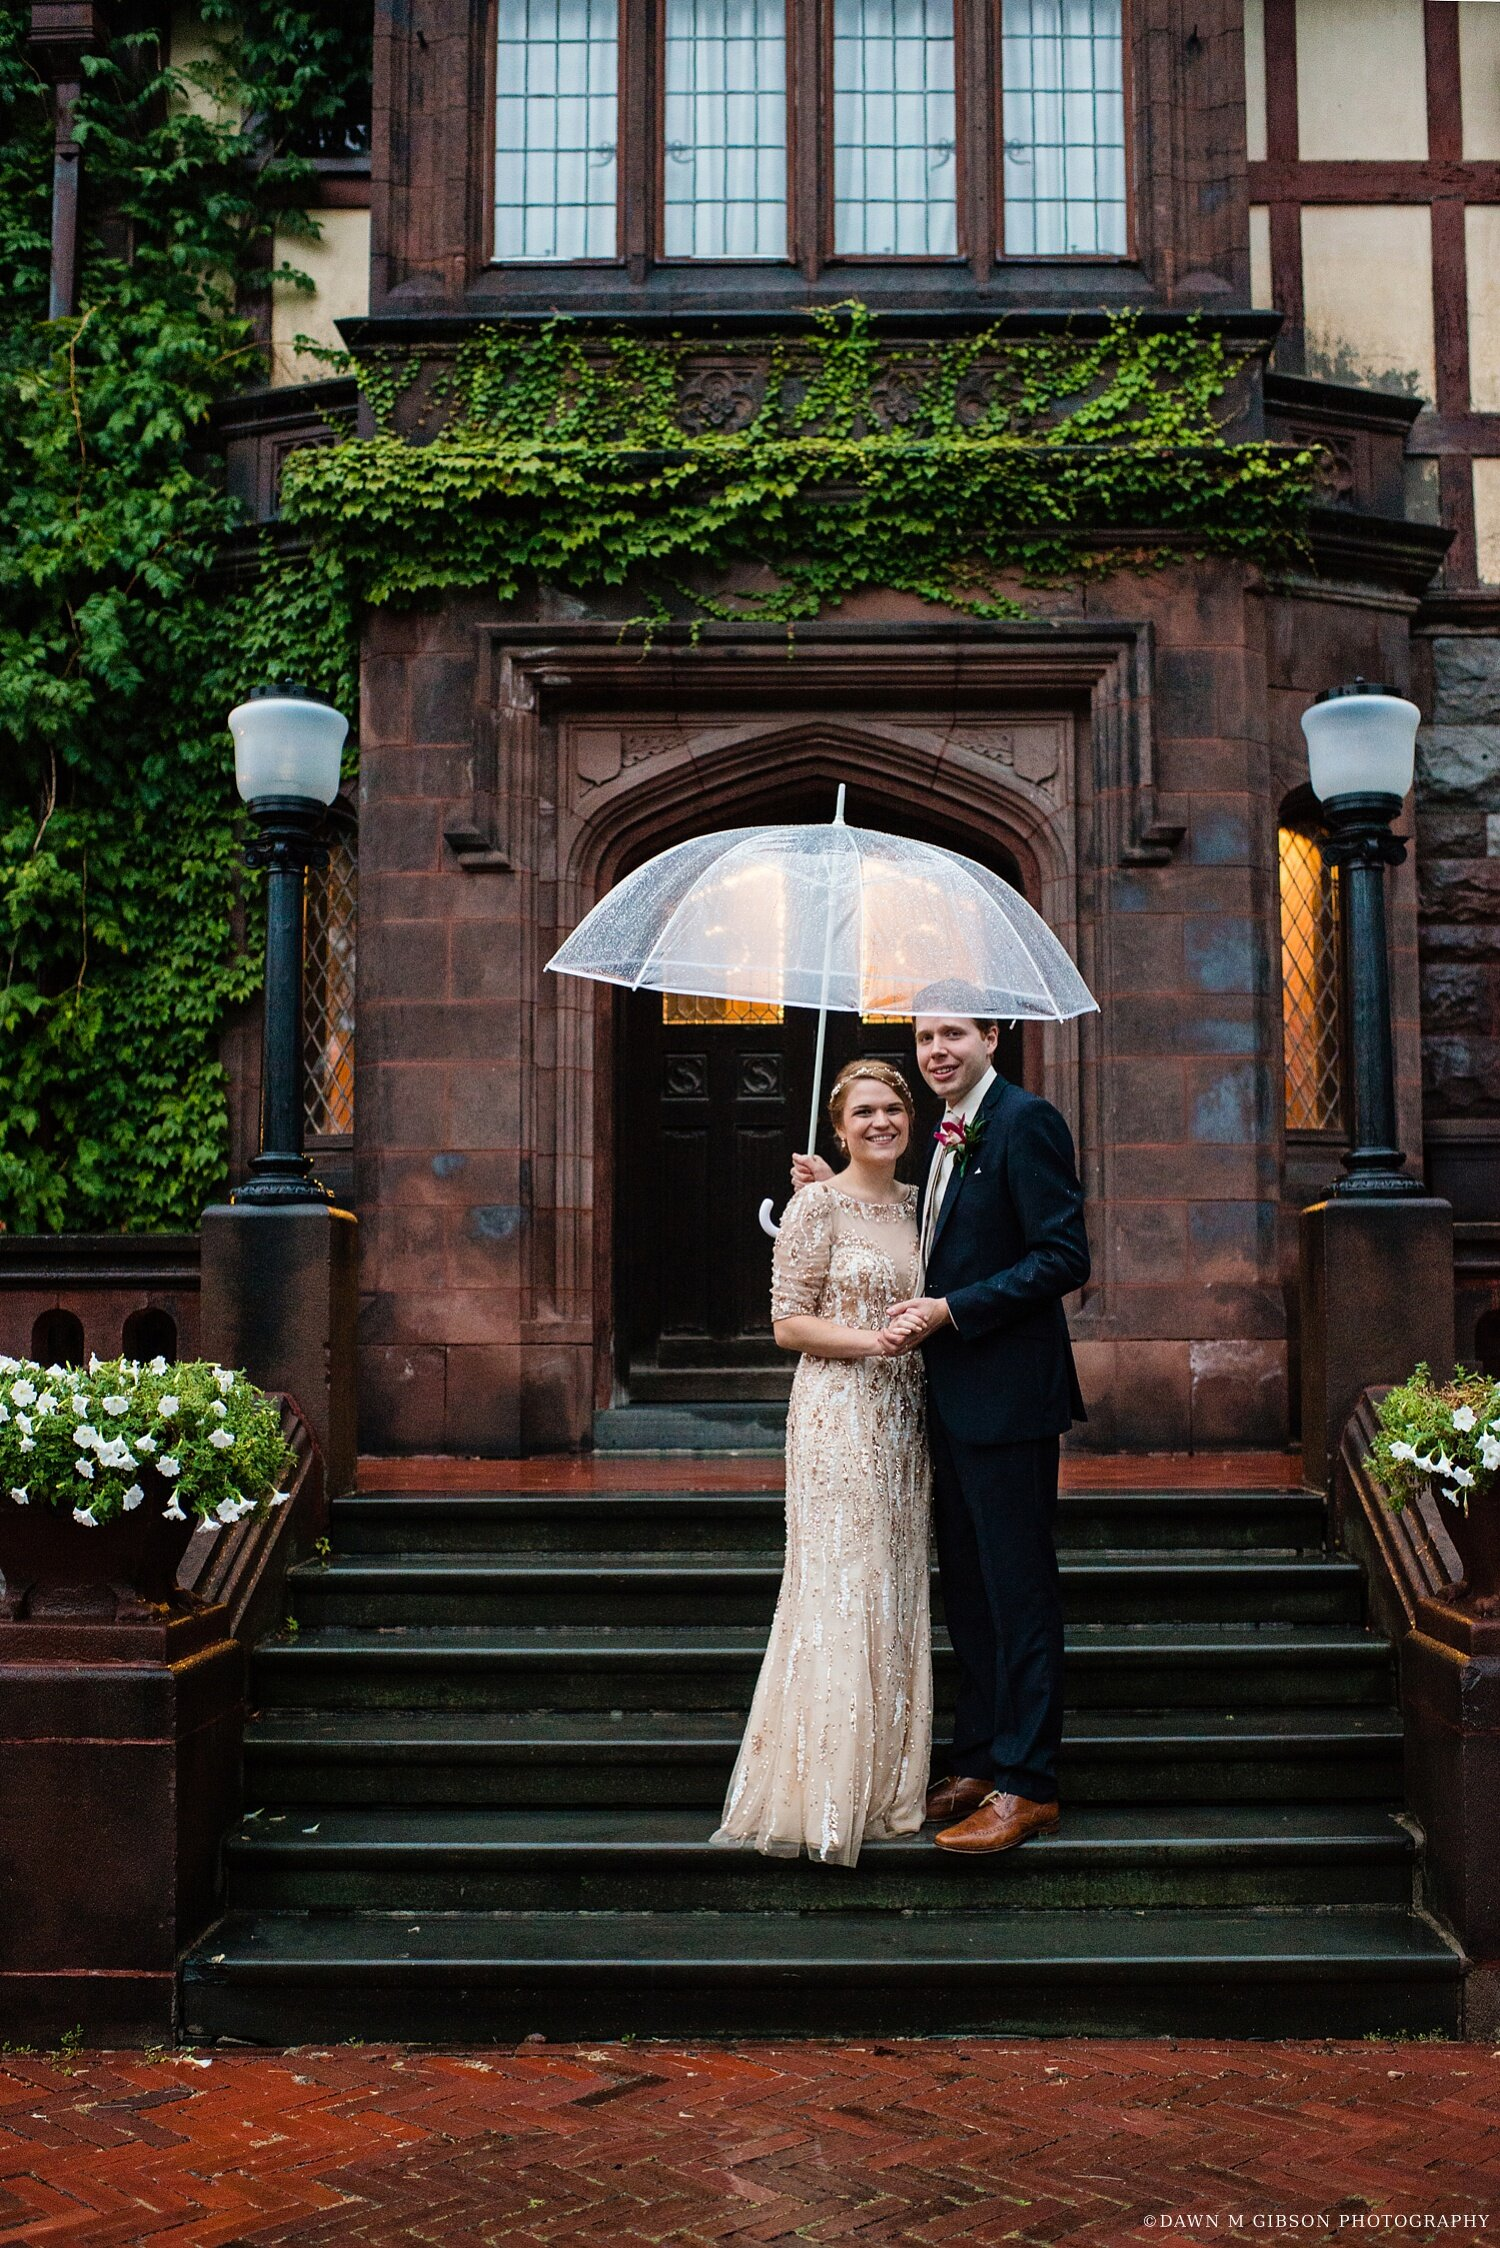 finger-lakes-newyork-wedding-photographer-sonnenberg-gardens-wedding-gold-wedding-dress-jenna-daniel_0067.jpg